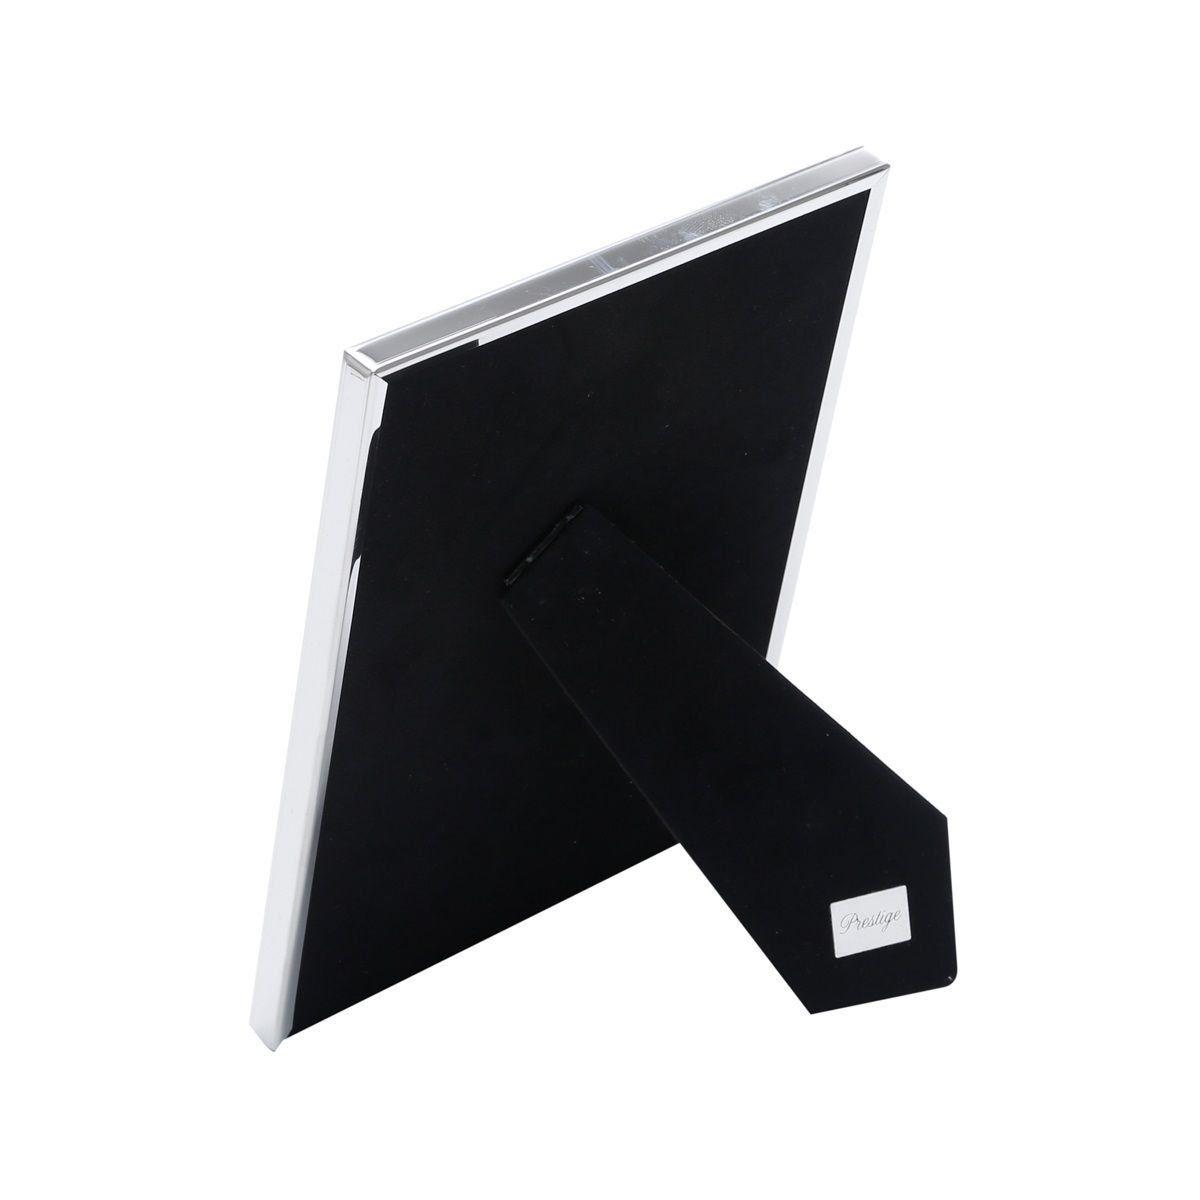 Porta-retrato 13 x 18 cm de plástico prateado Family Prestige - 25507